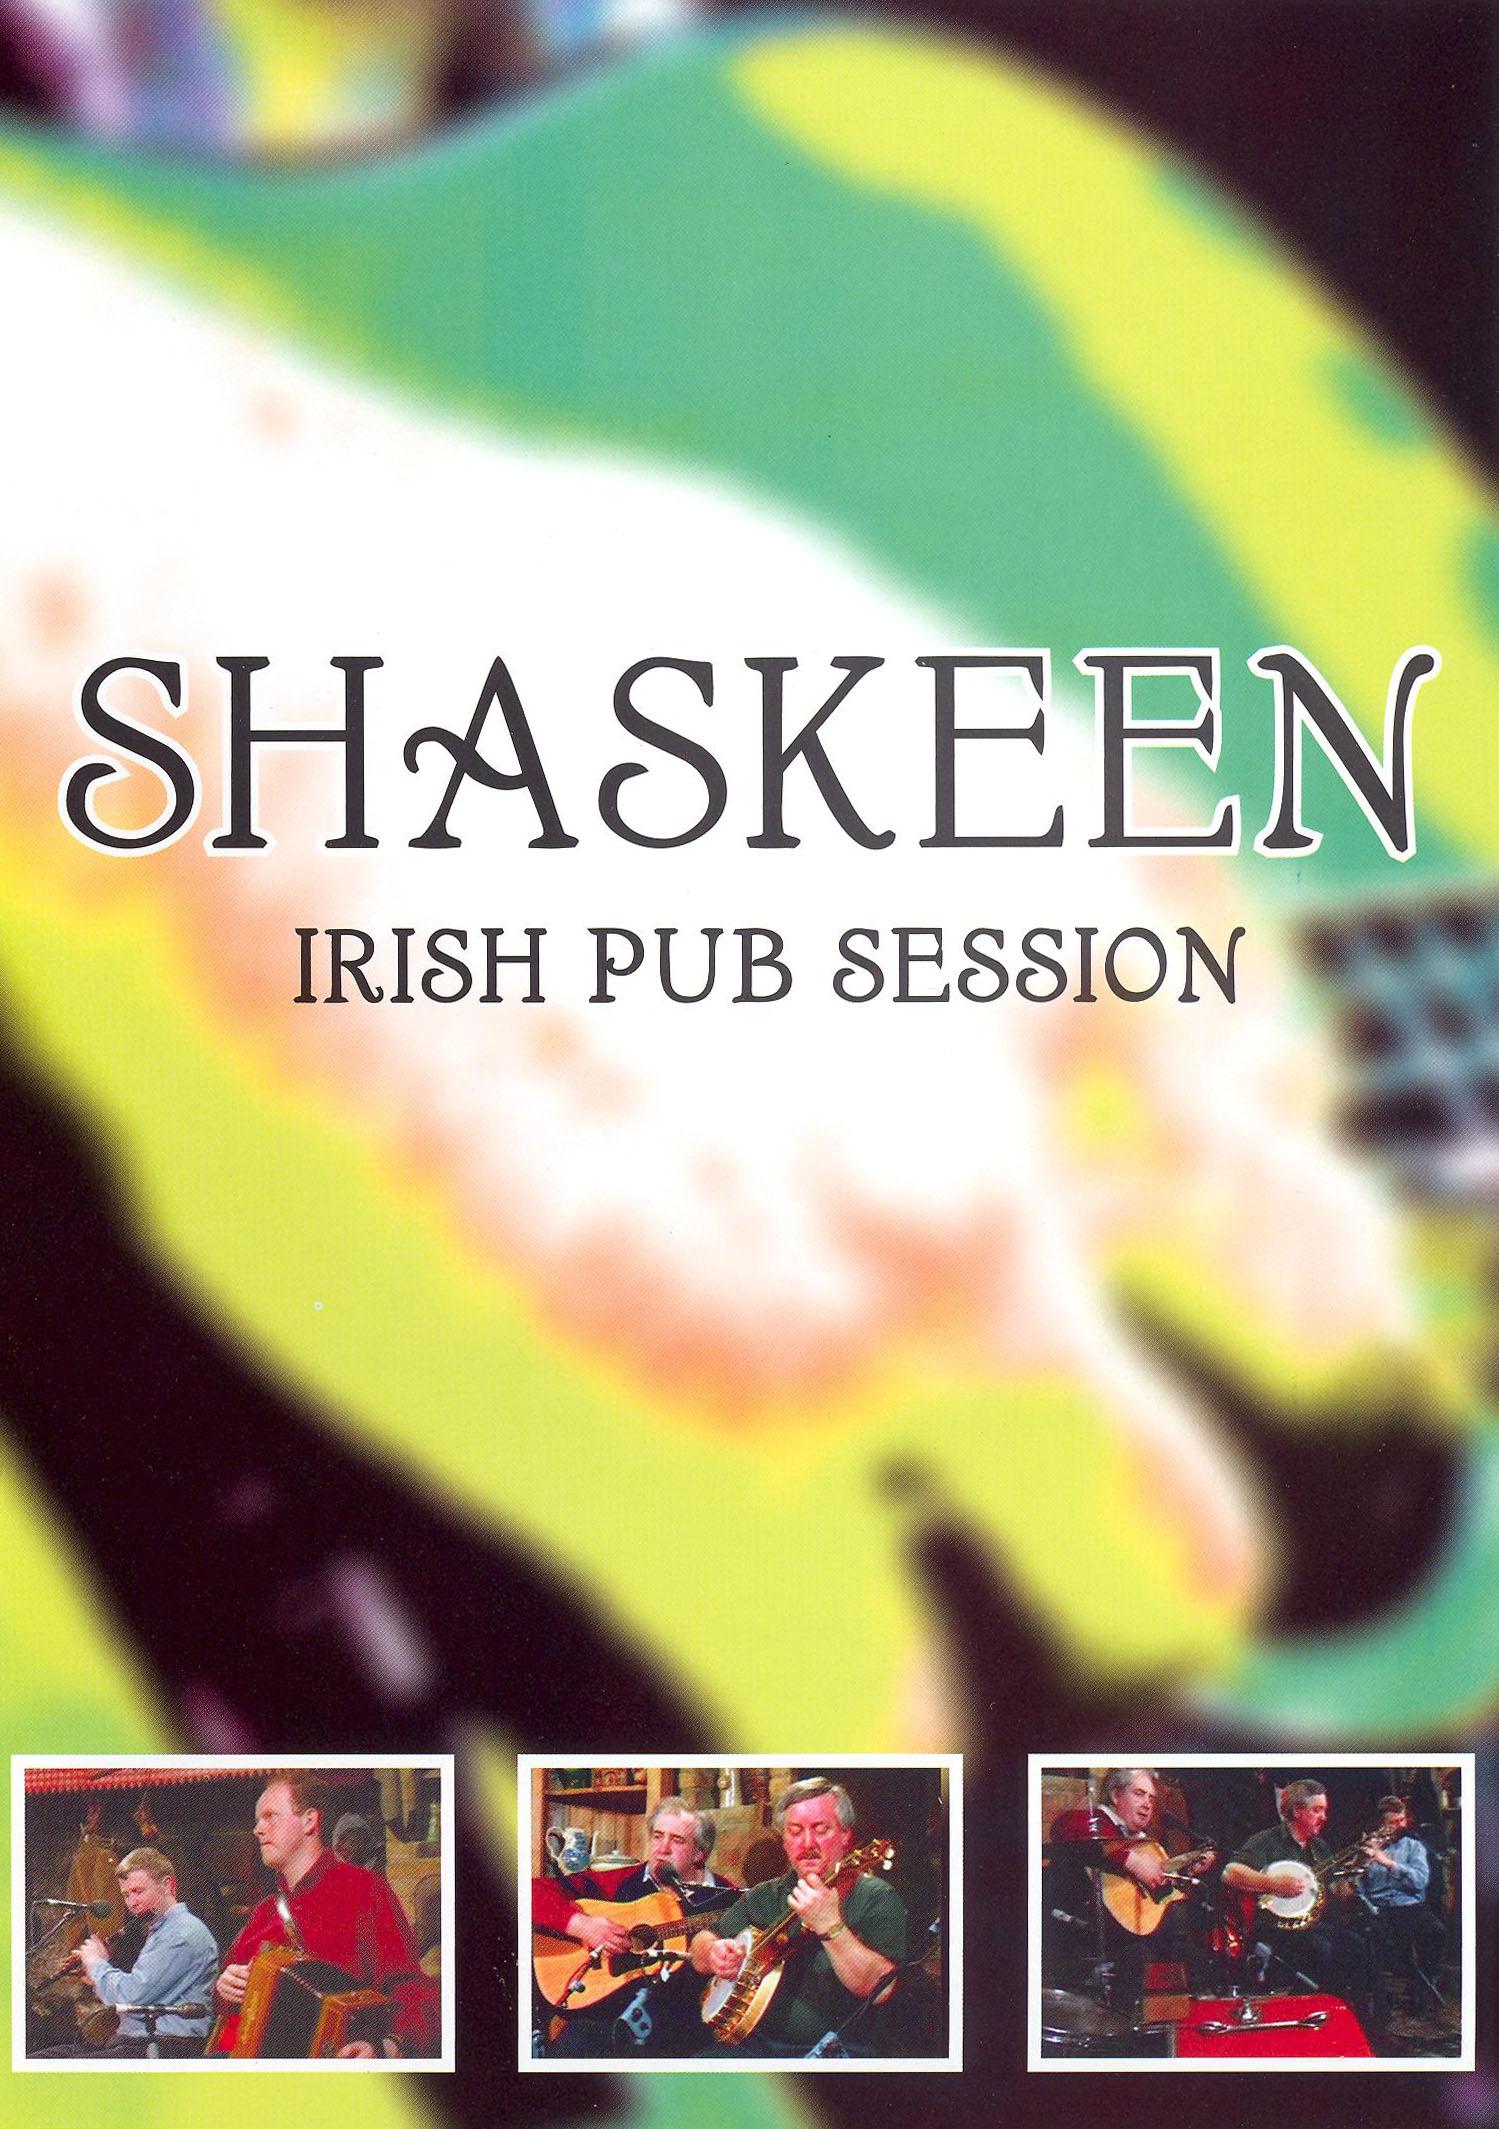 Shaskeen: Irish Pub Sessions